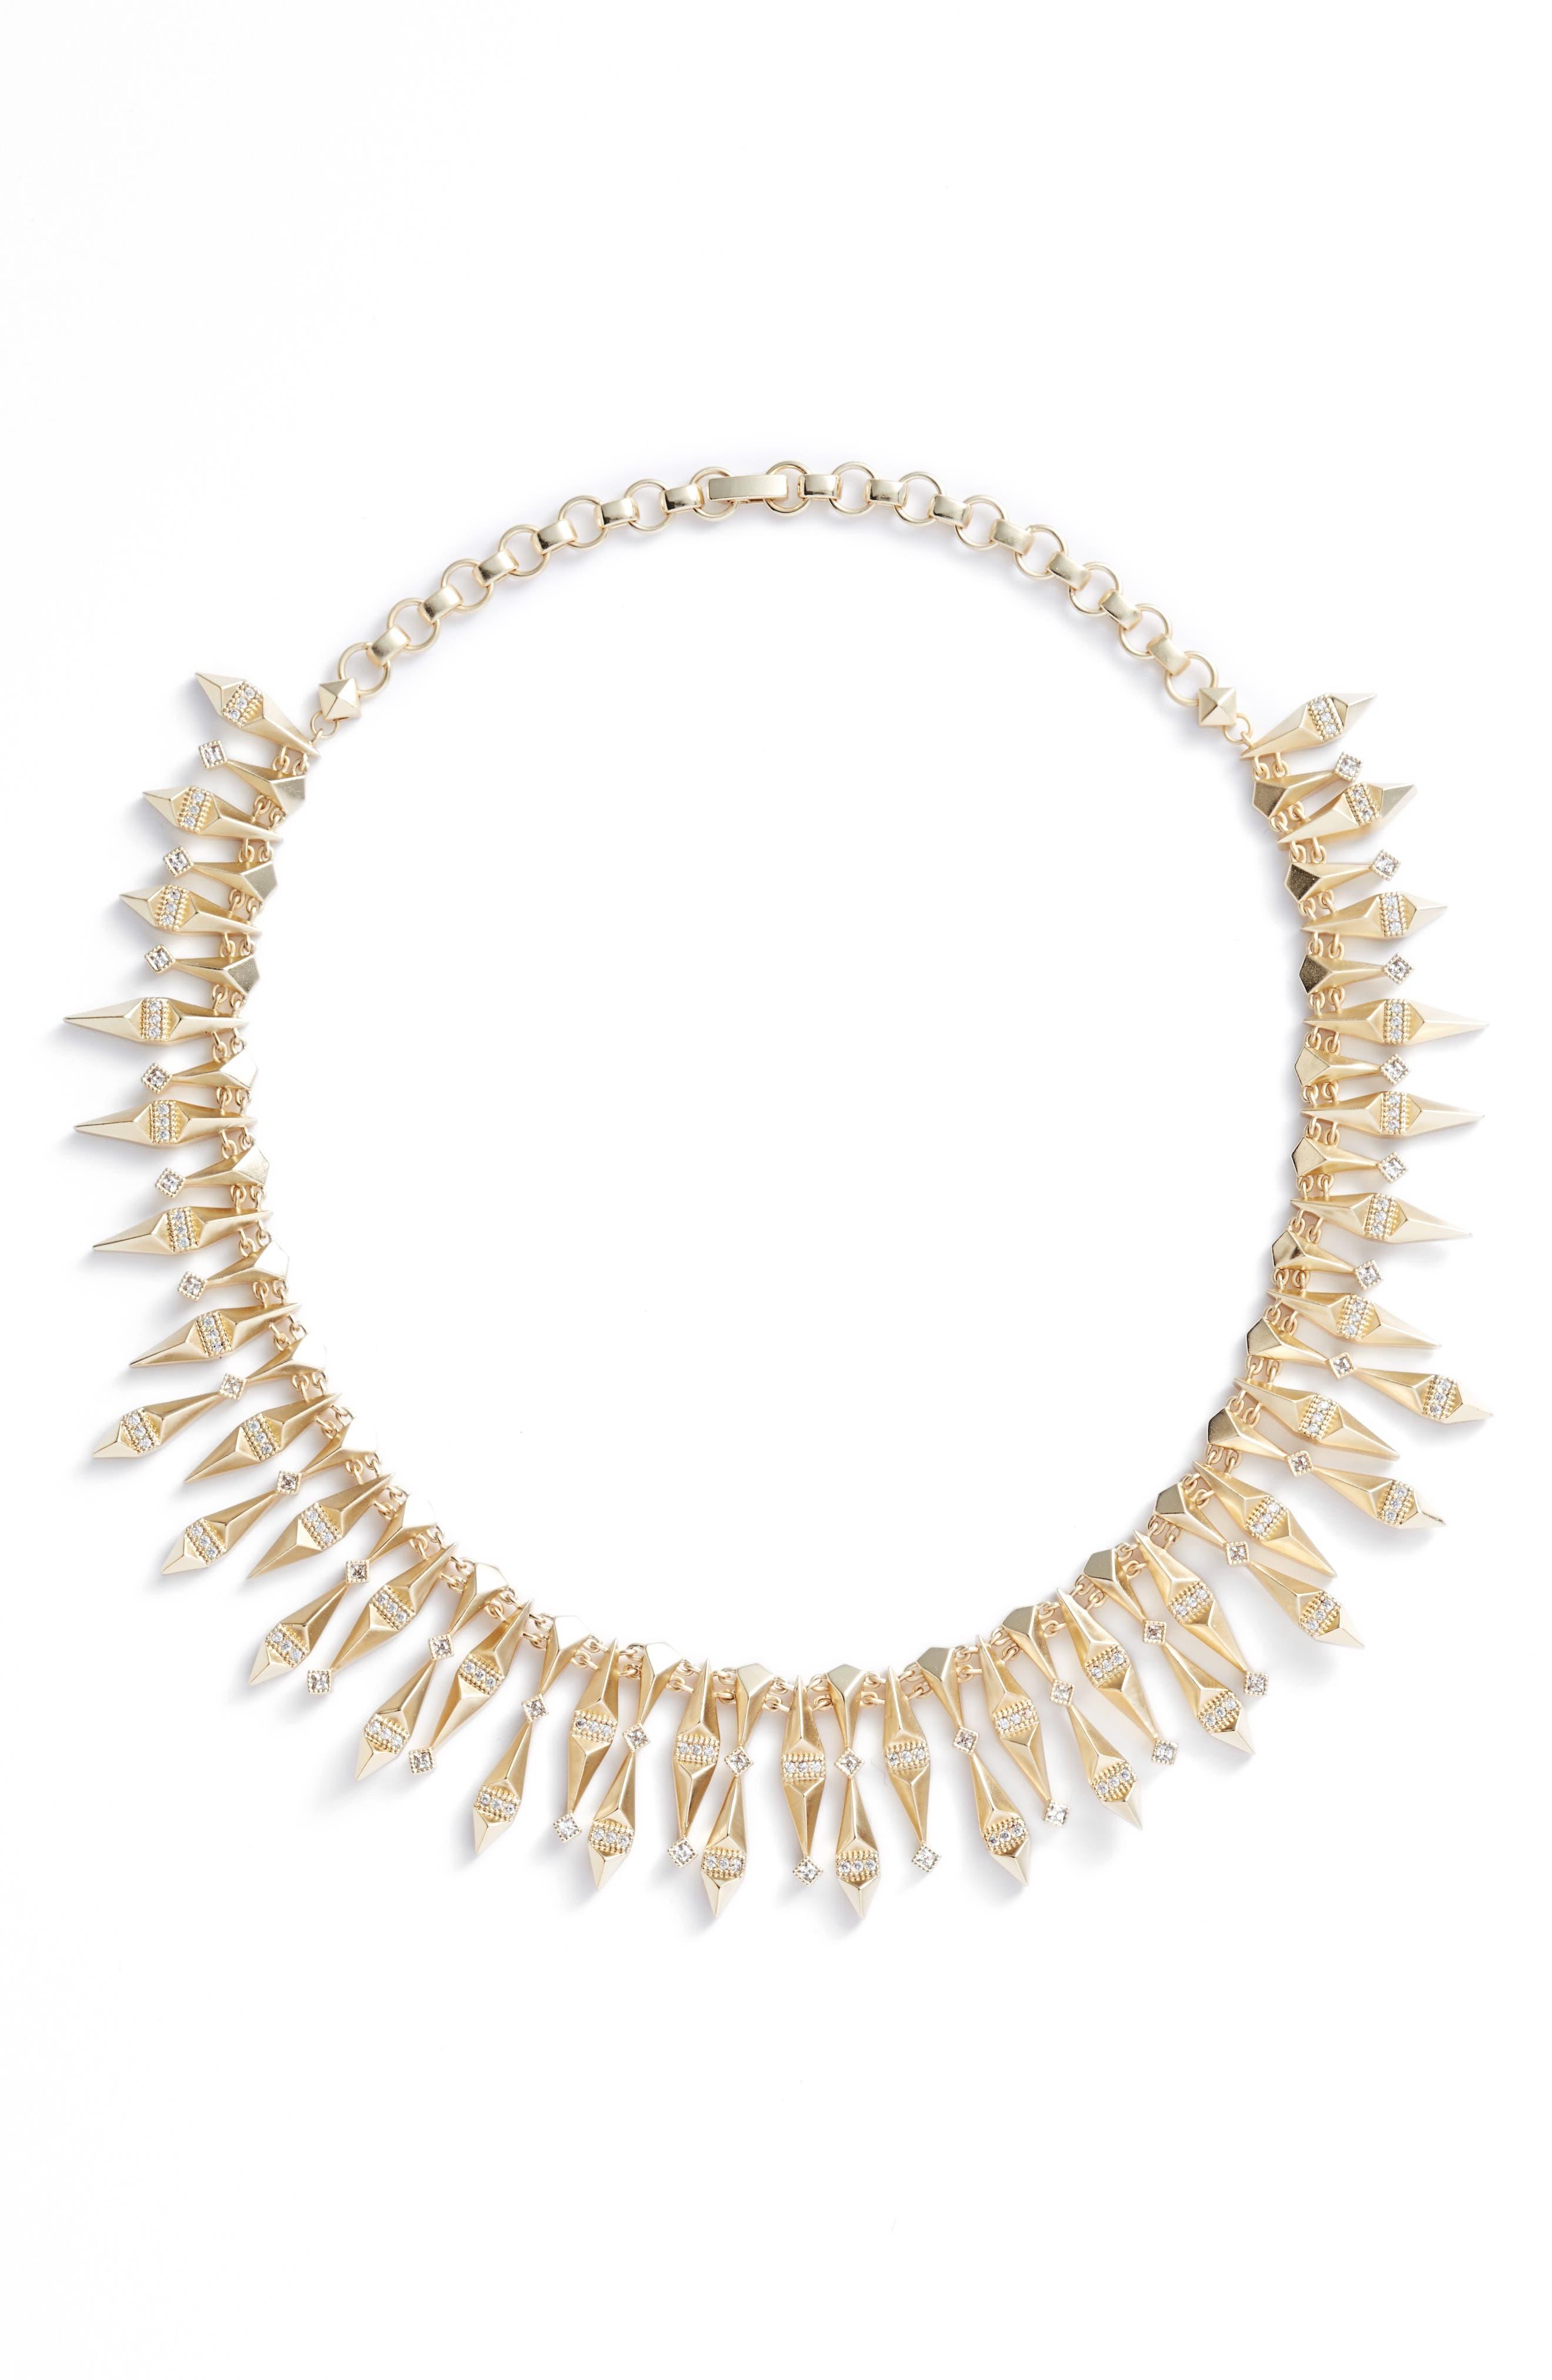 Main Image - Kendra Scott Cici Collar Necklace